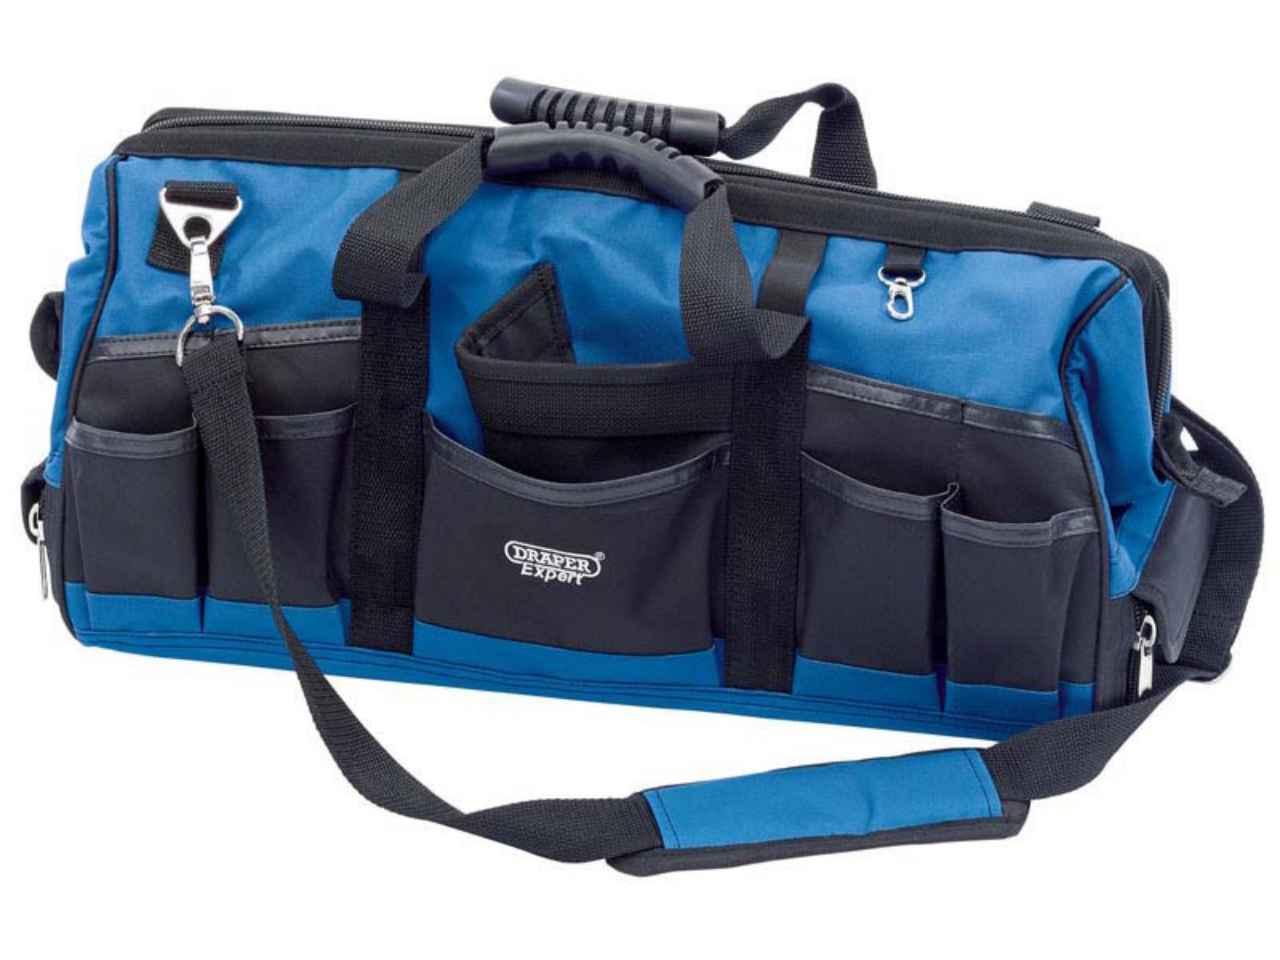 Draper B519A 610 x 170 x 190mm Canvas 20L Tool Bag